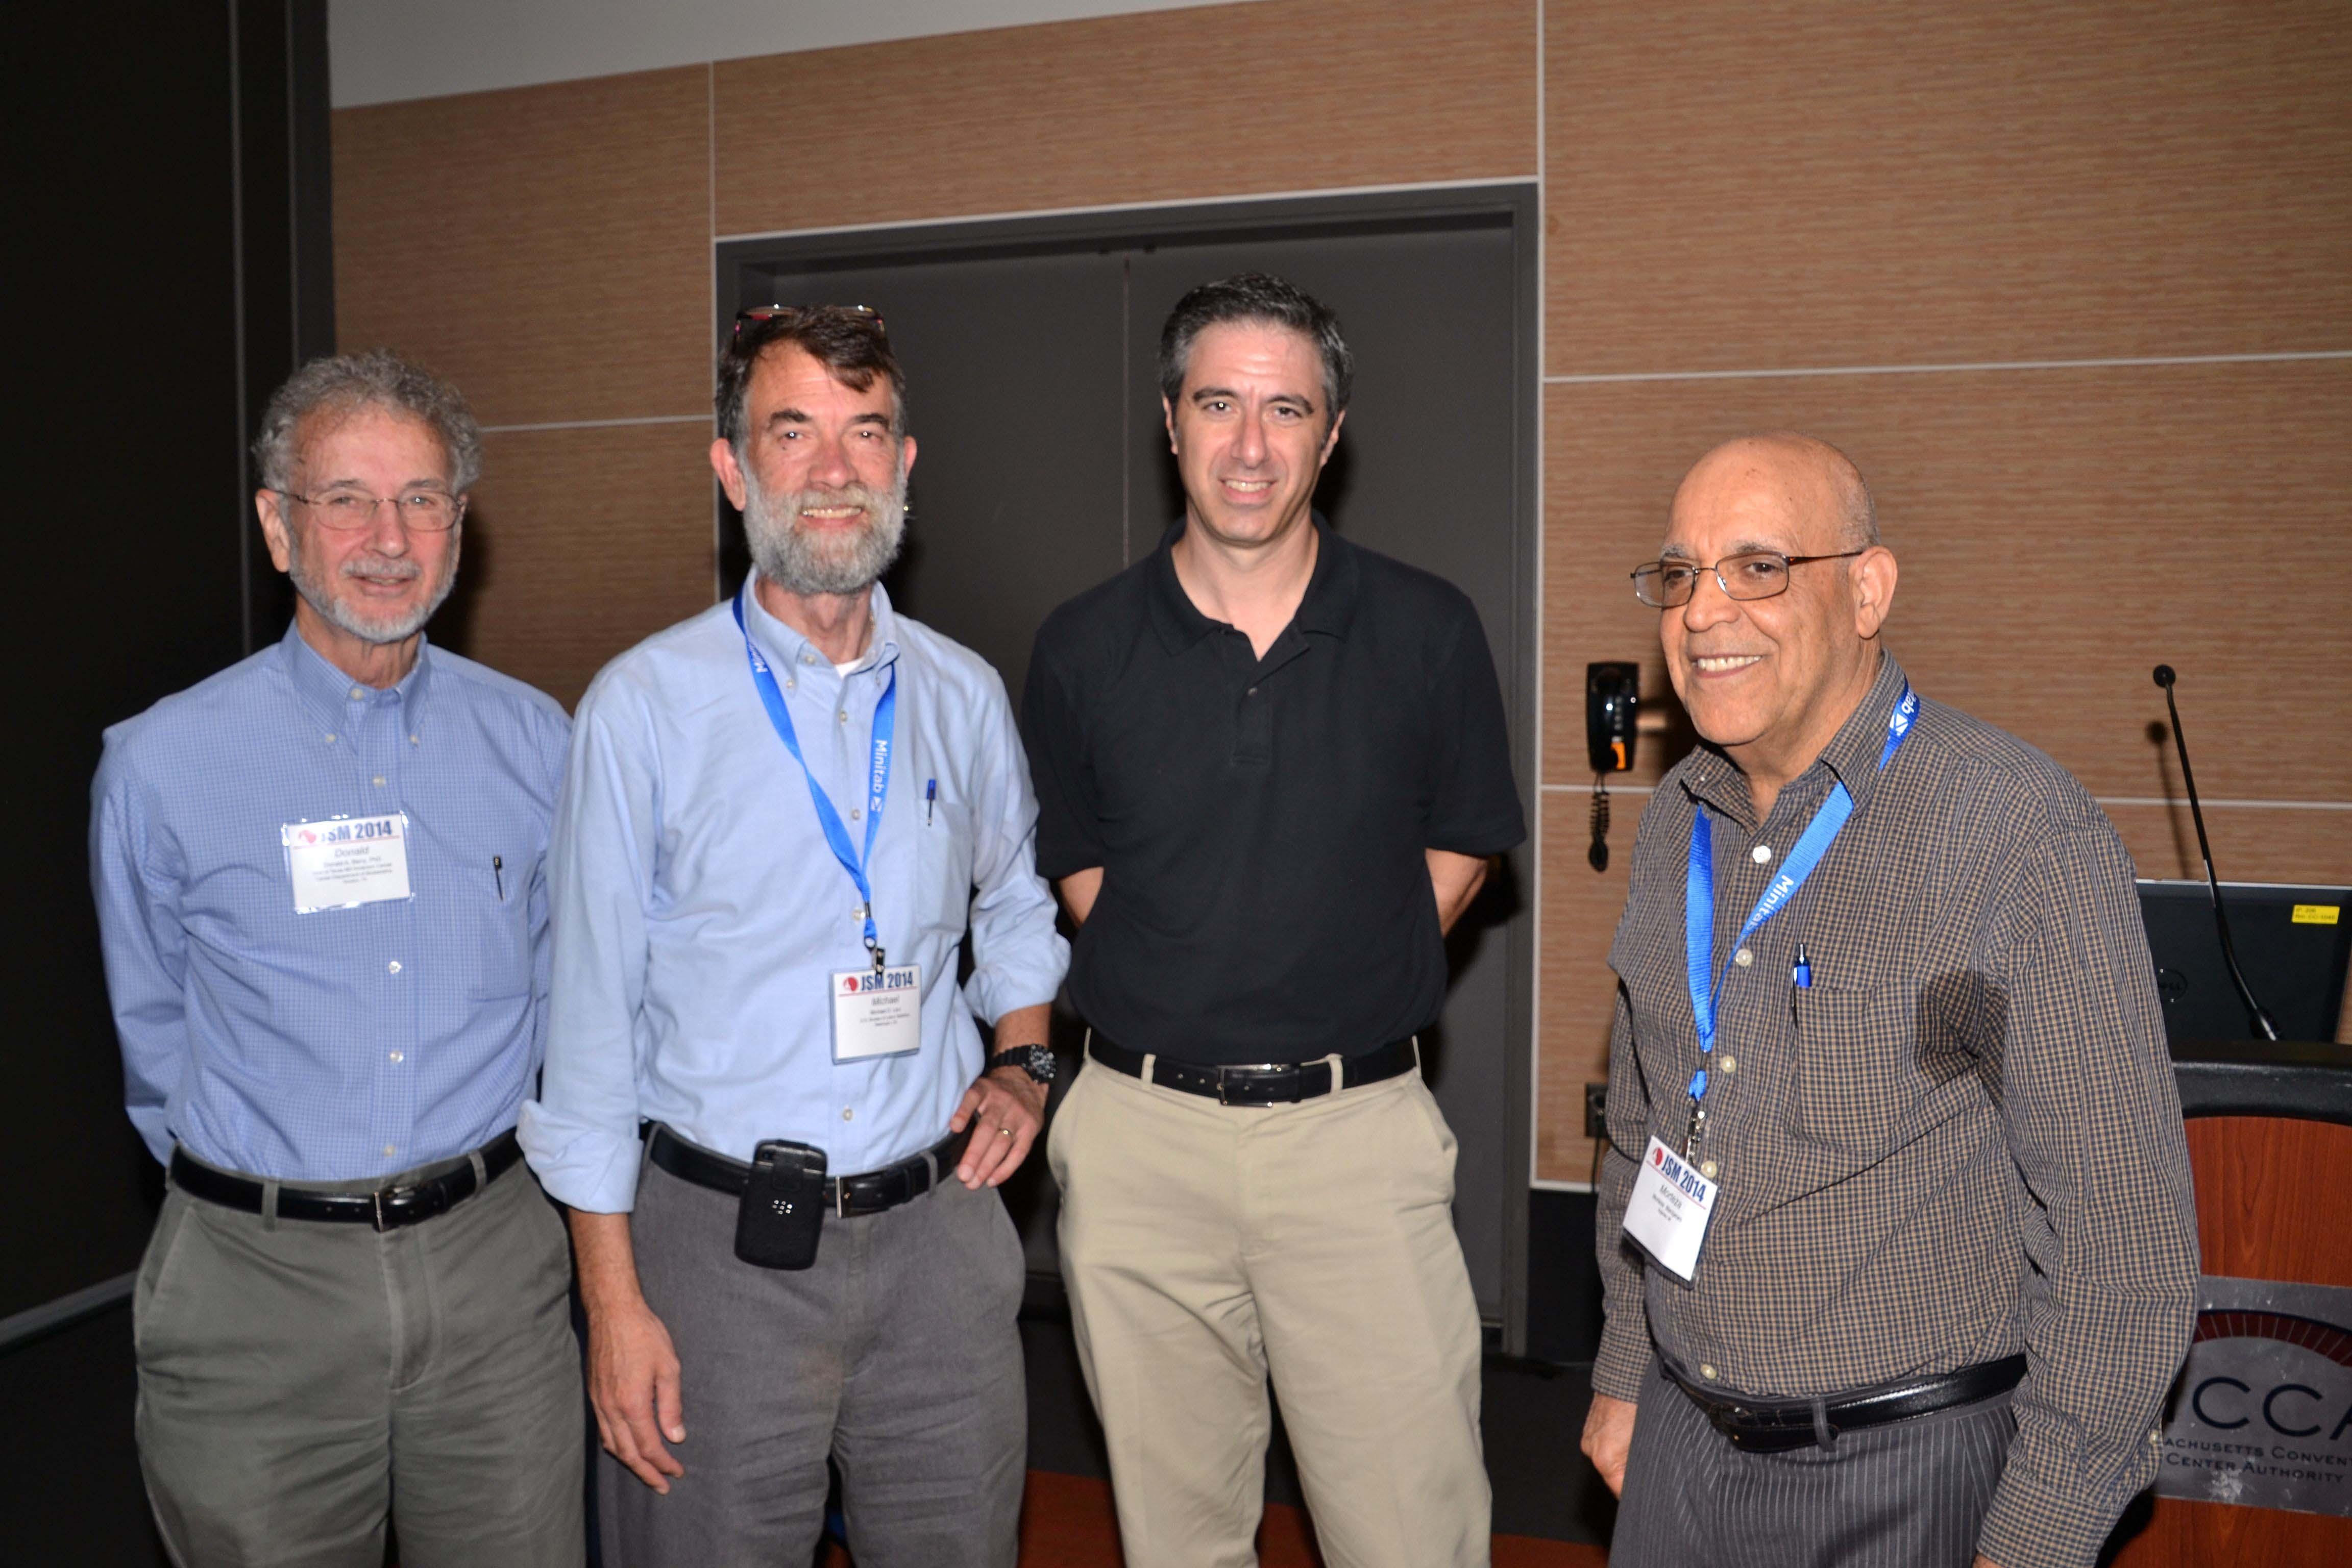 Statistics and the Media presenters (from left): Donald Berry, MD Anderson Cancer Center;  Michael Levi, Bureau of Labor Statistics; Alan Schwarz, New York Times; and Morteza Marzjarani (organizer)